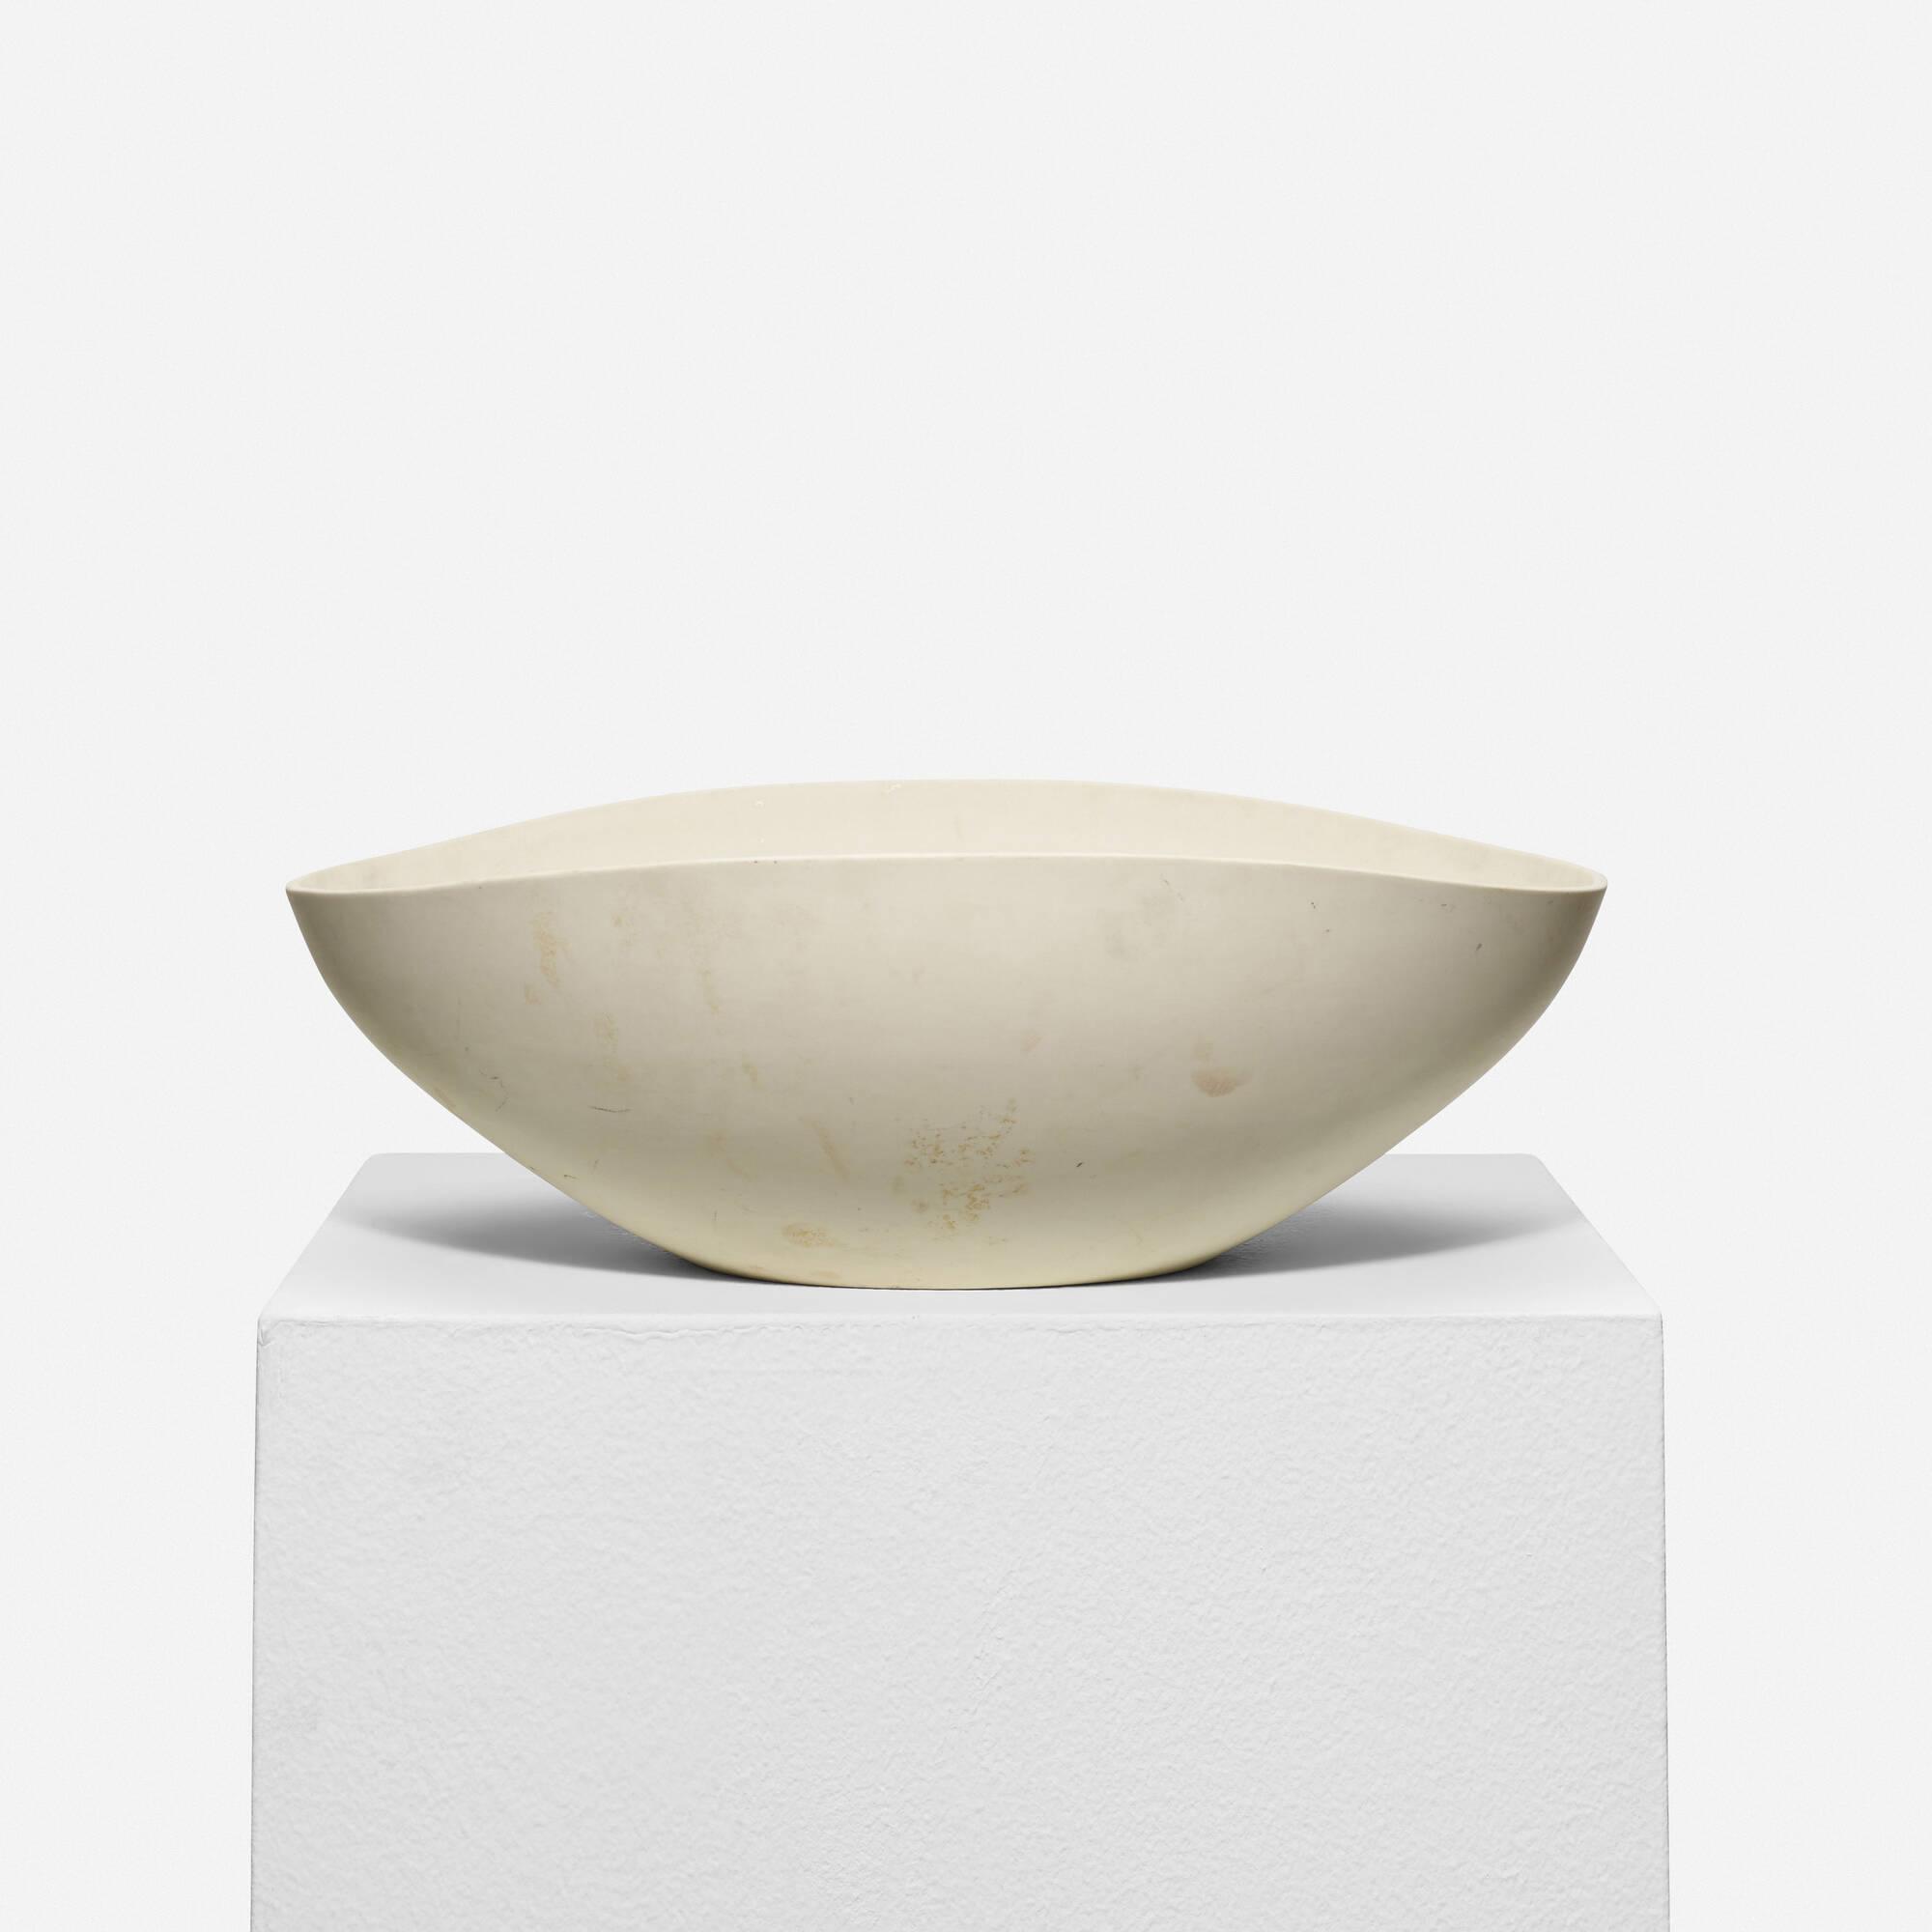 325: Eva Zeisel / prototype Museum Shape bowl (2 of 2)